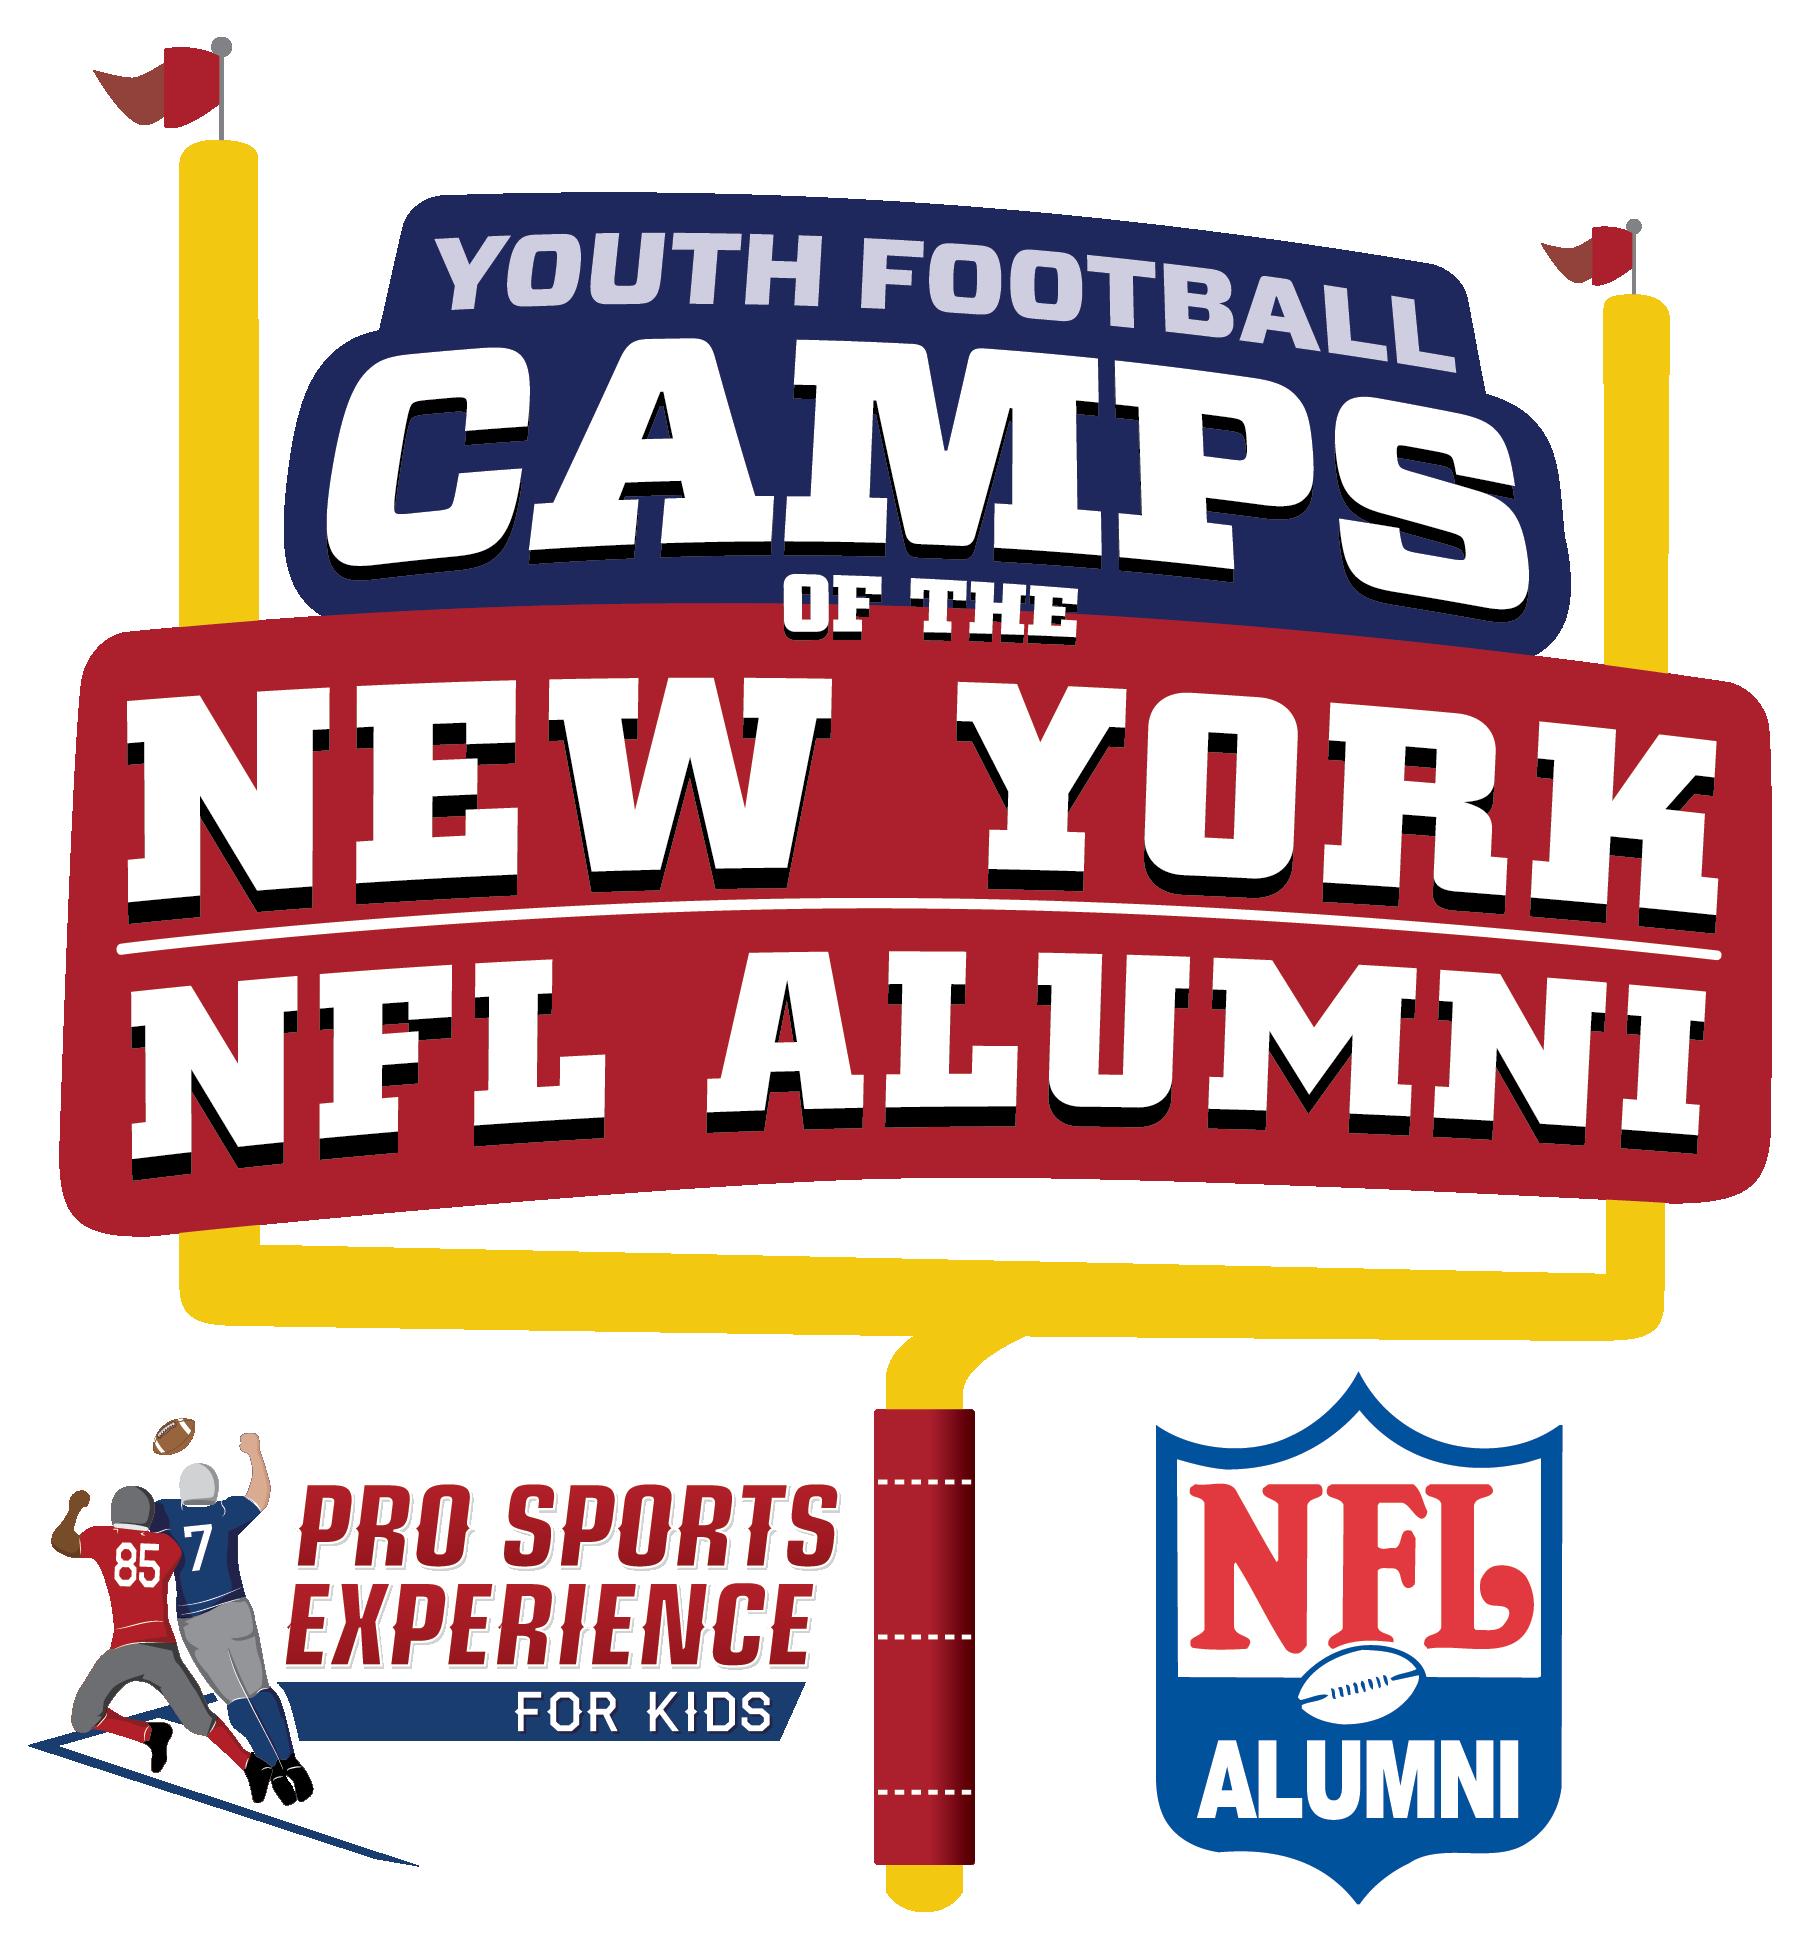 New York NFL Alumni Hero Youth Football Camps - Woodbridge